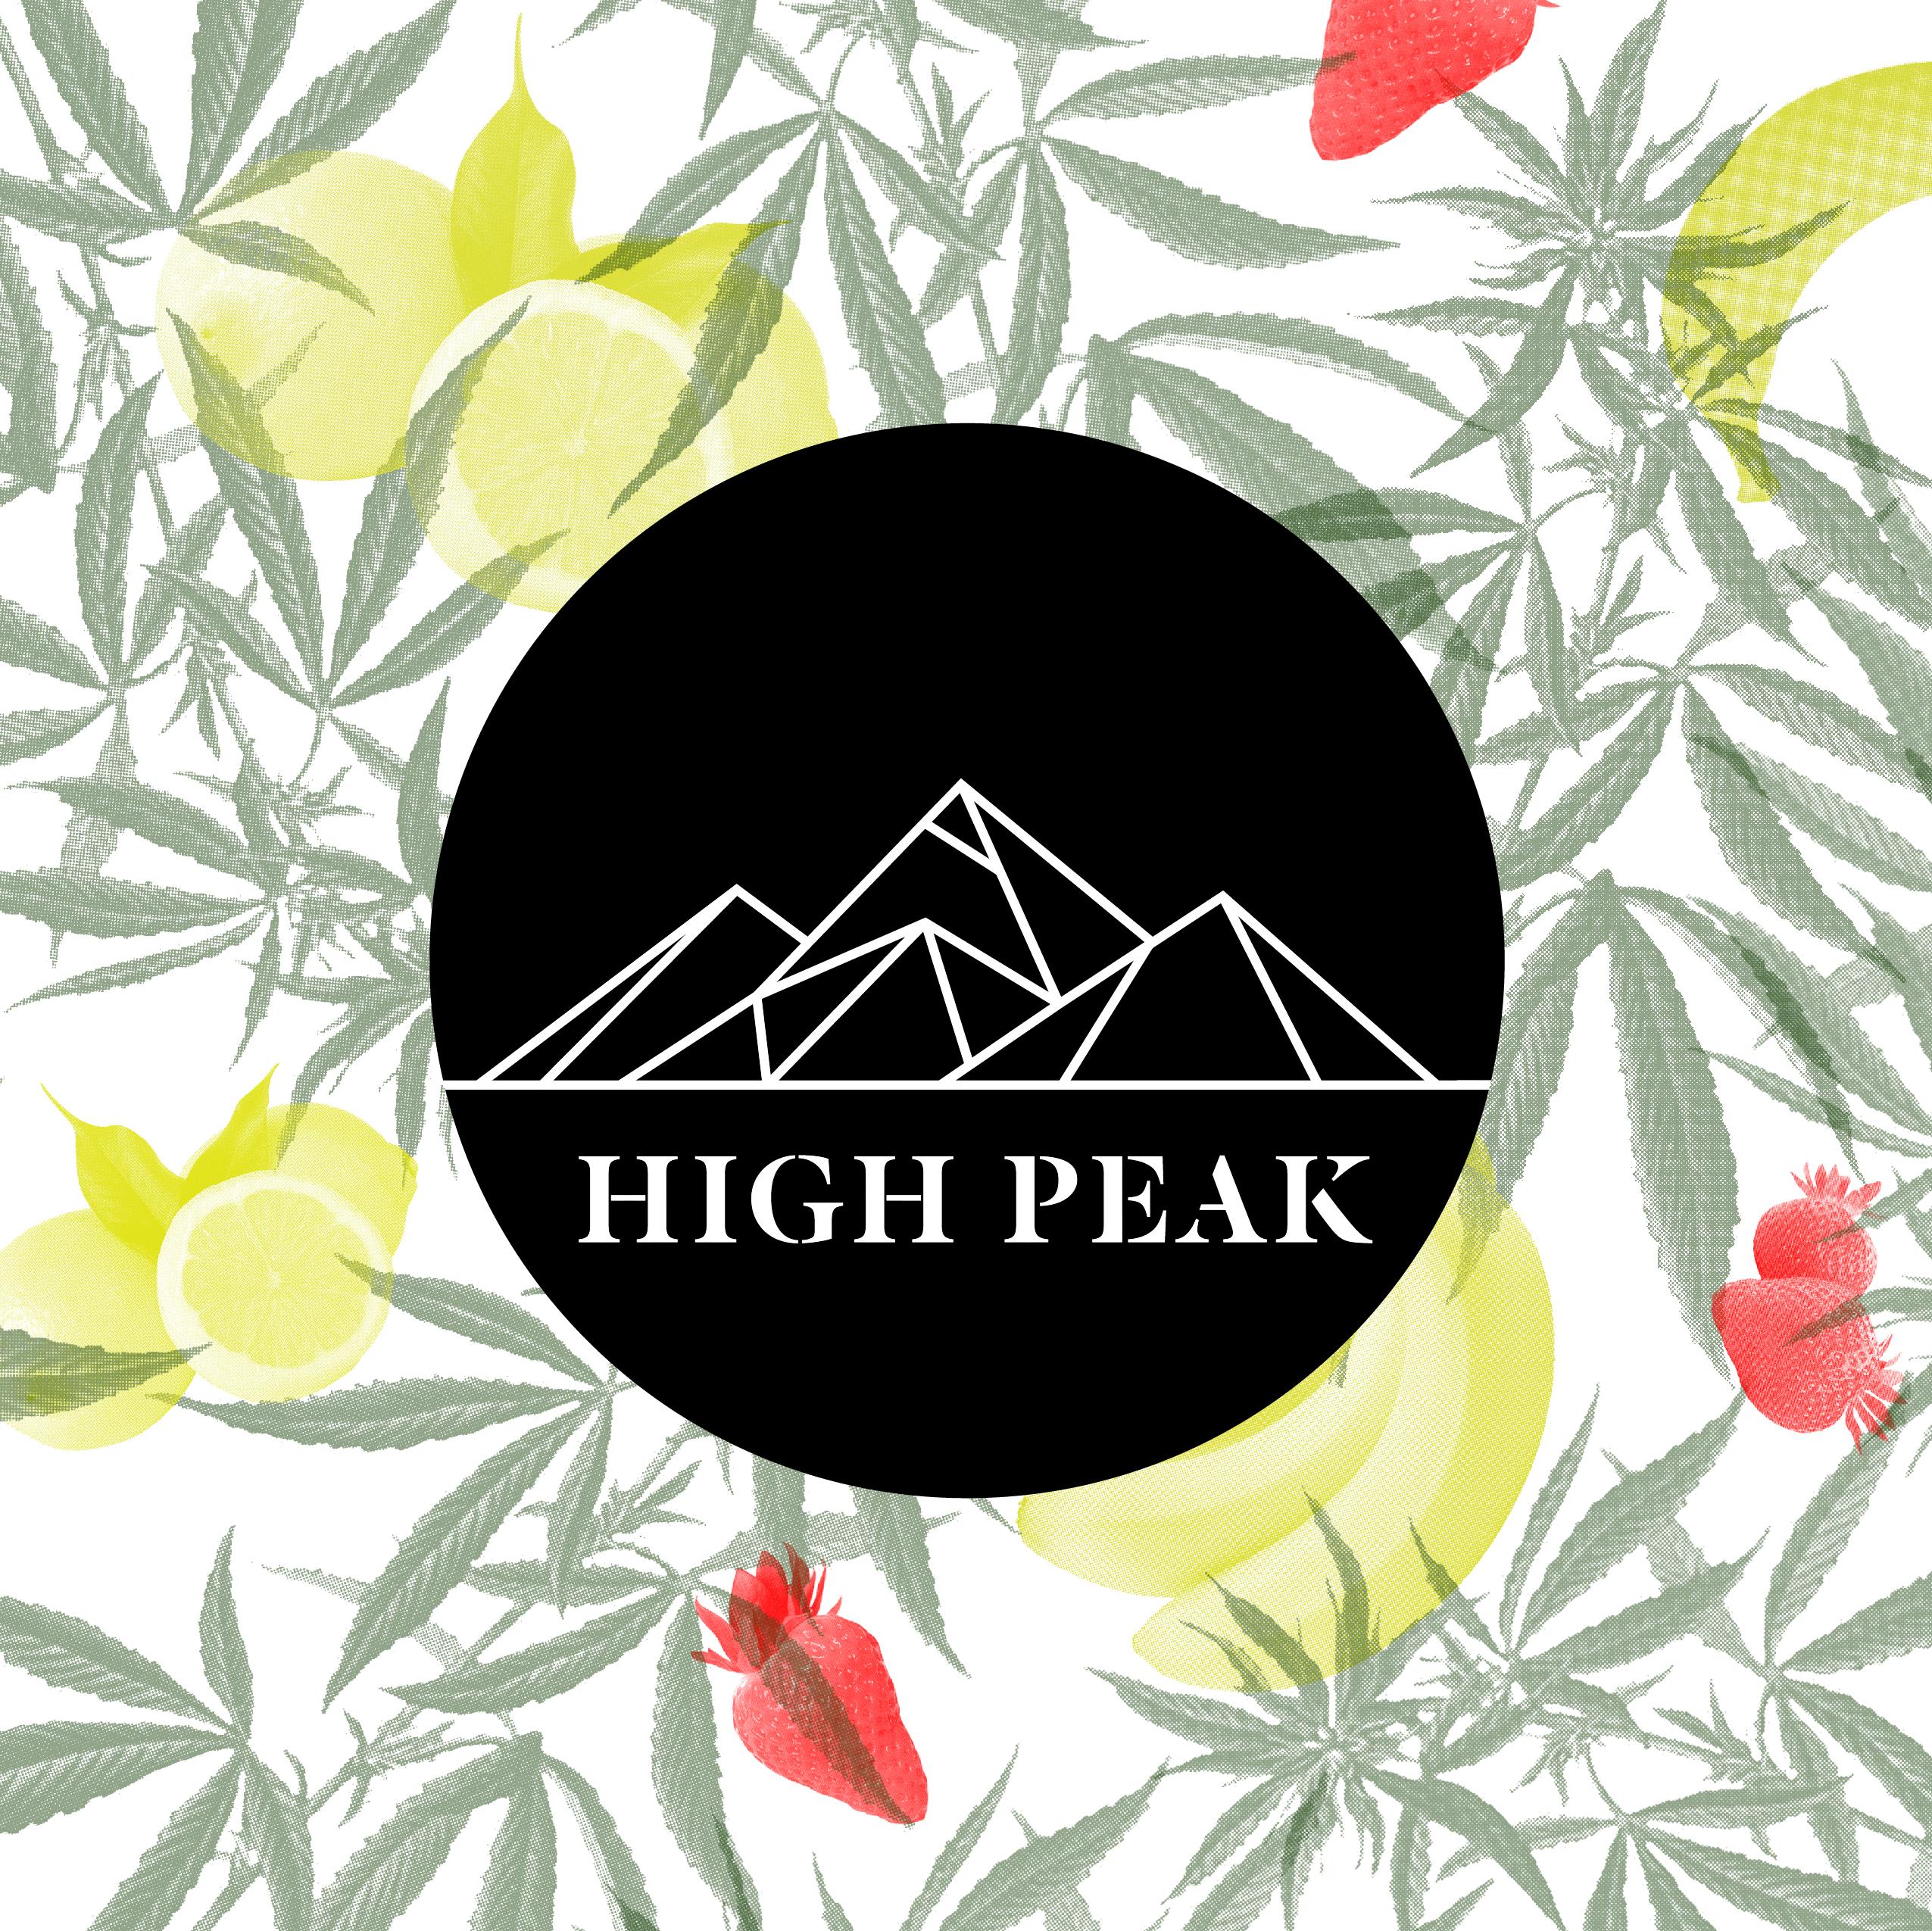 High Peak_01